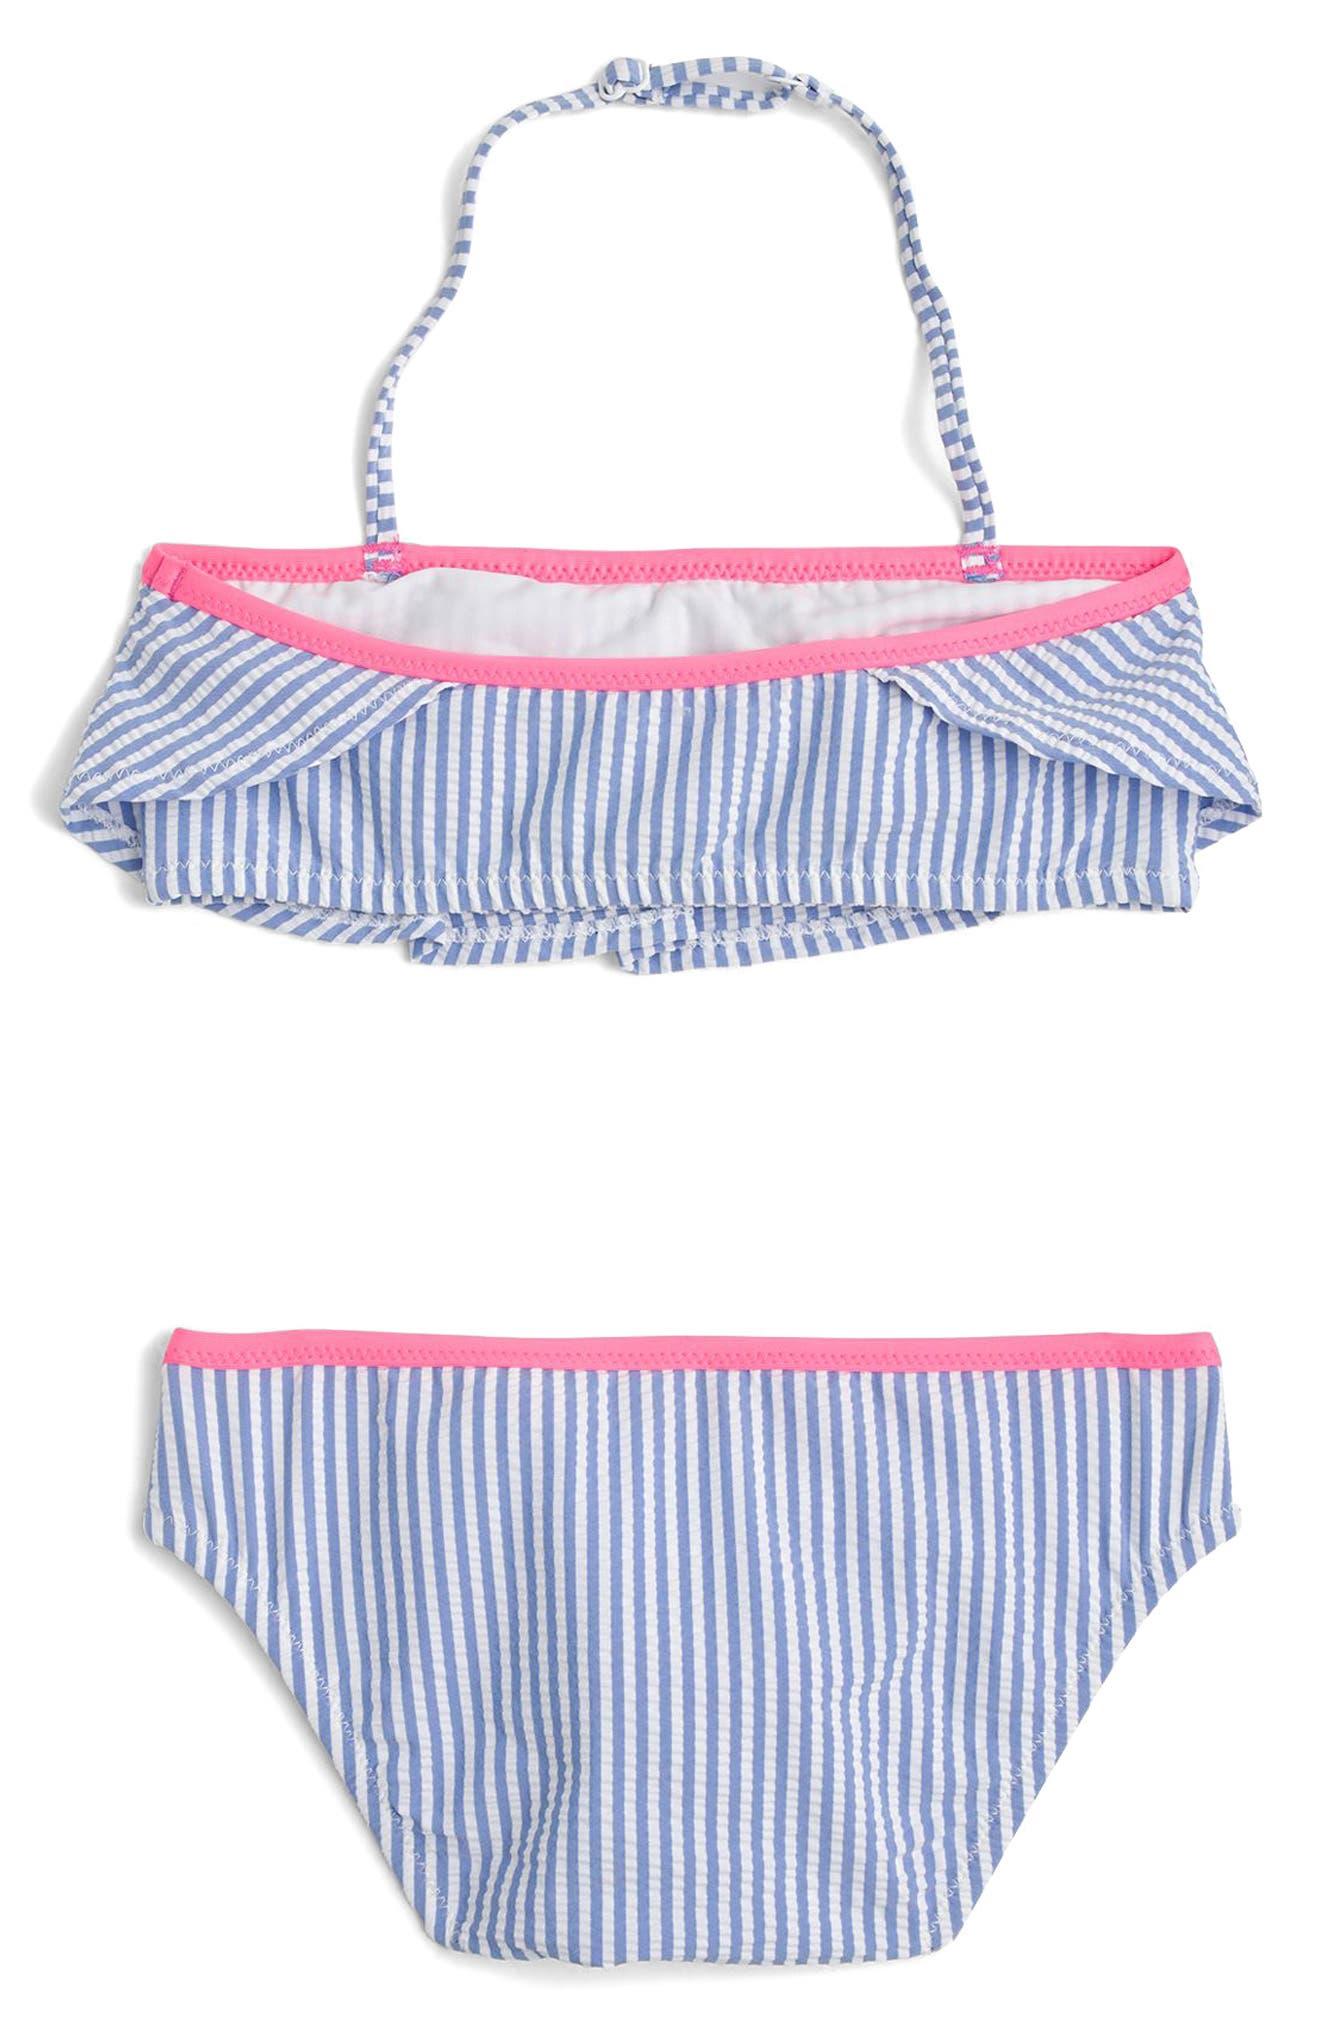 Ruffled Seersucker Two-Piece Bikini Swimsuit,                             Alternate thumbnail 2, color,                             Blue Pink Multi